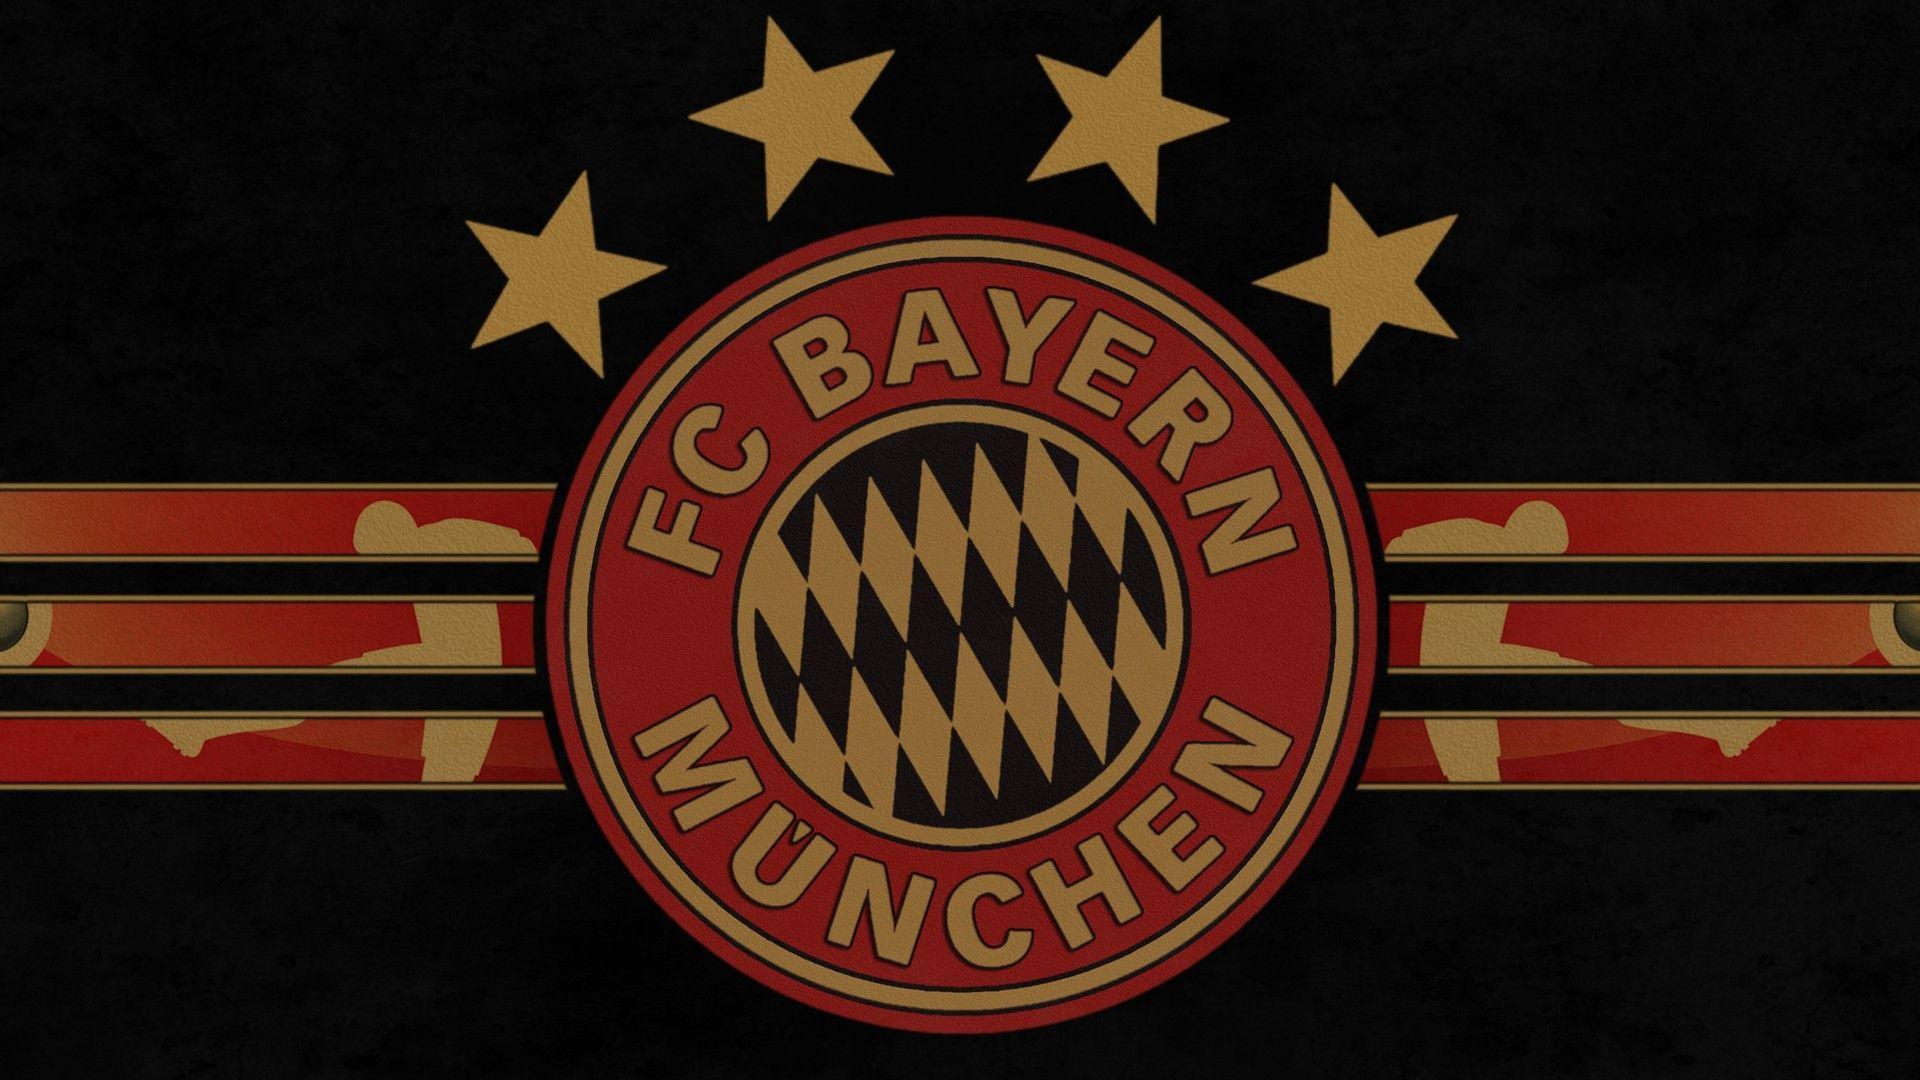 Bayern Munich FC German Sports Club Backgrounds